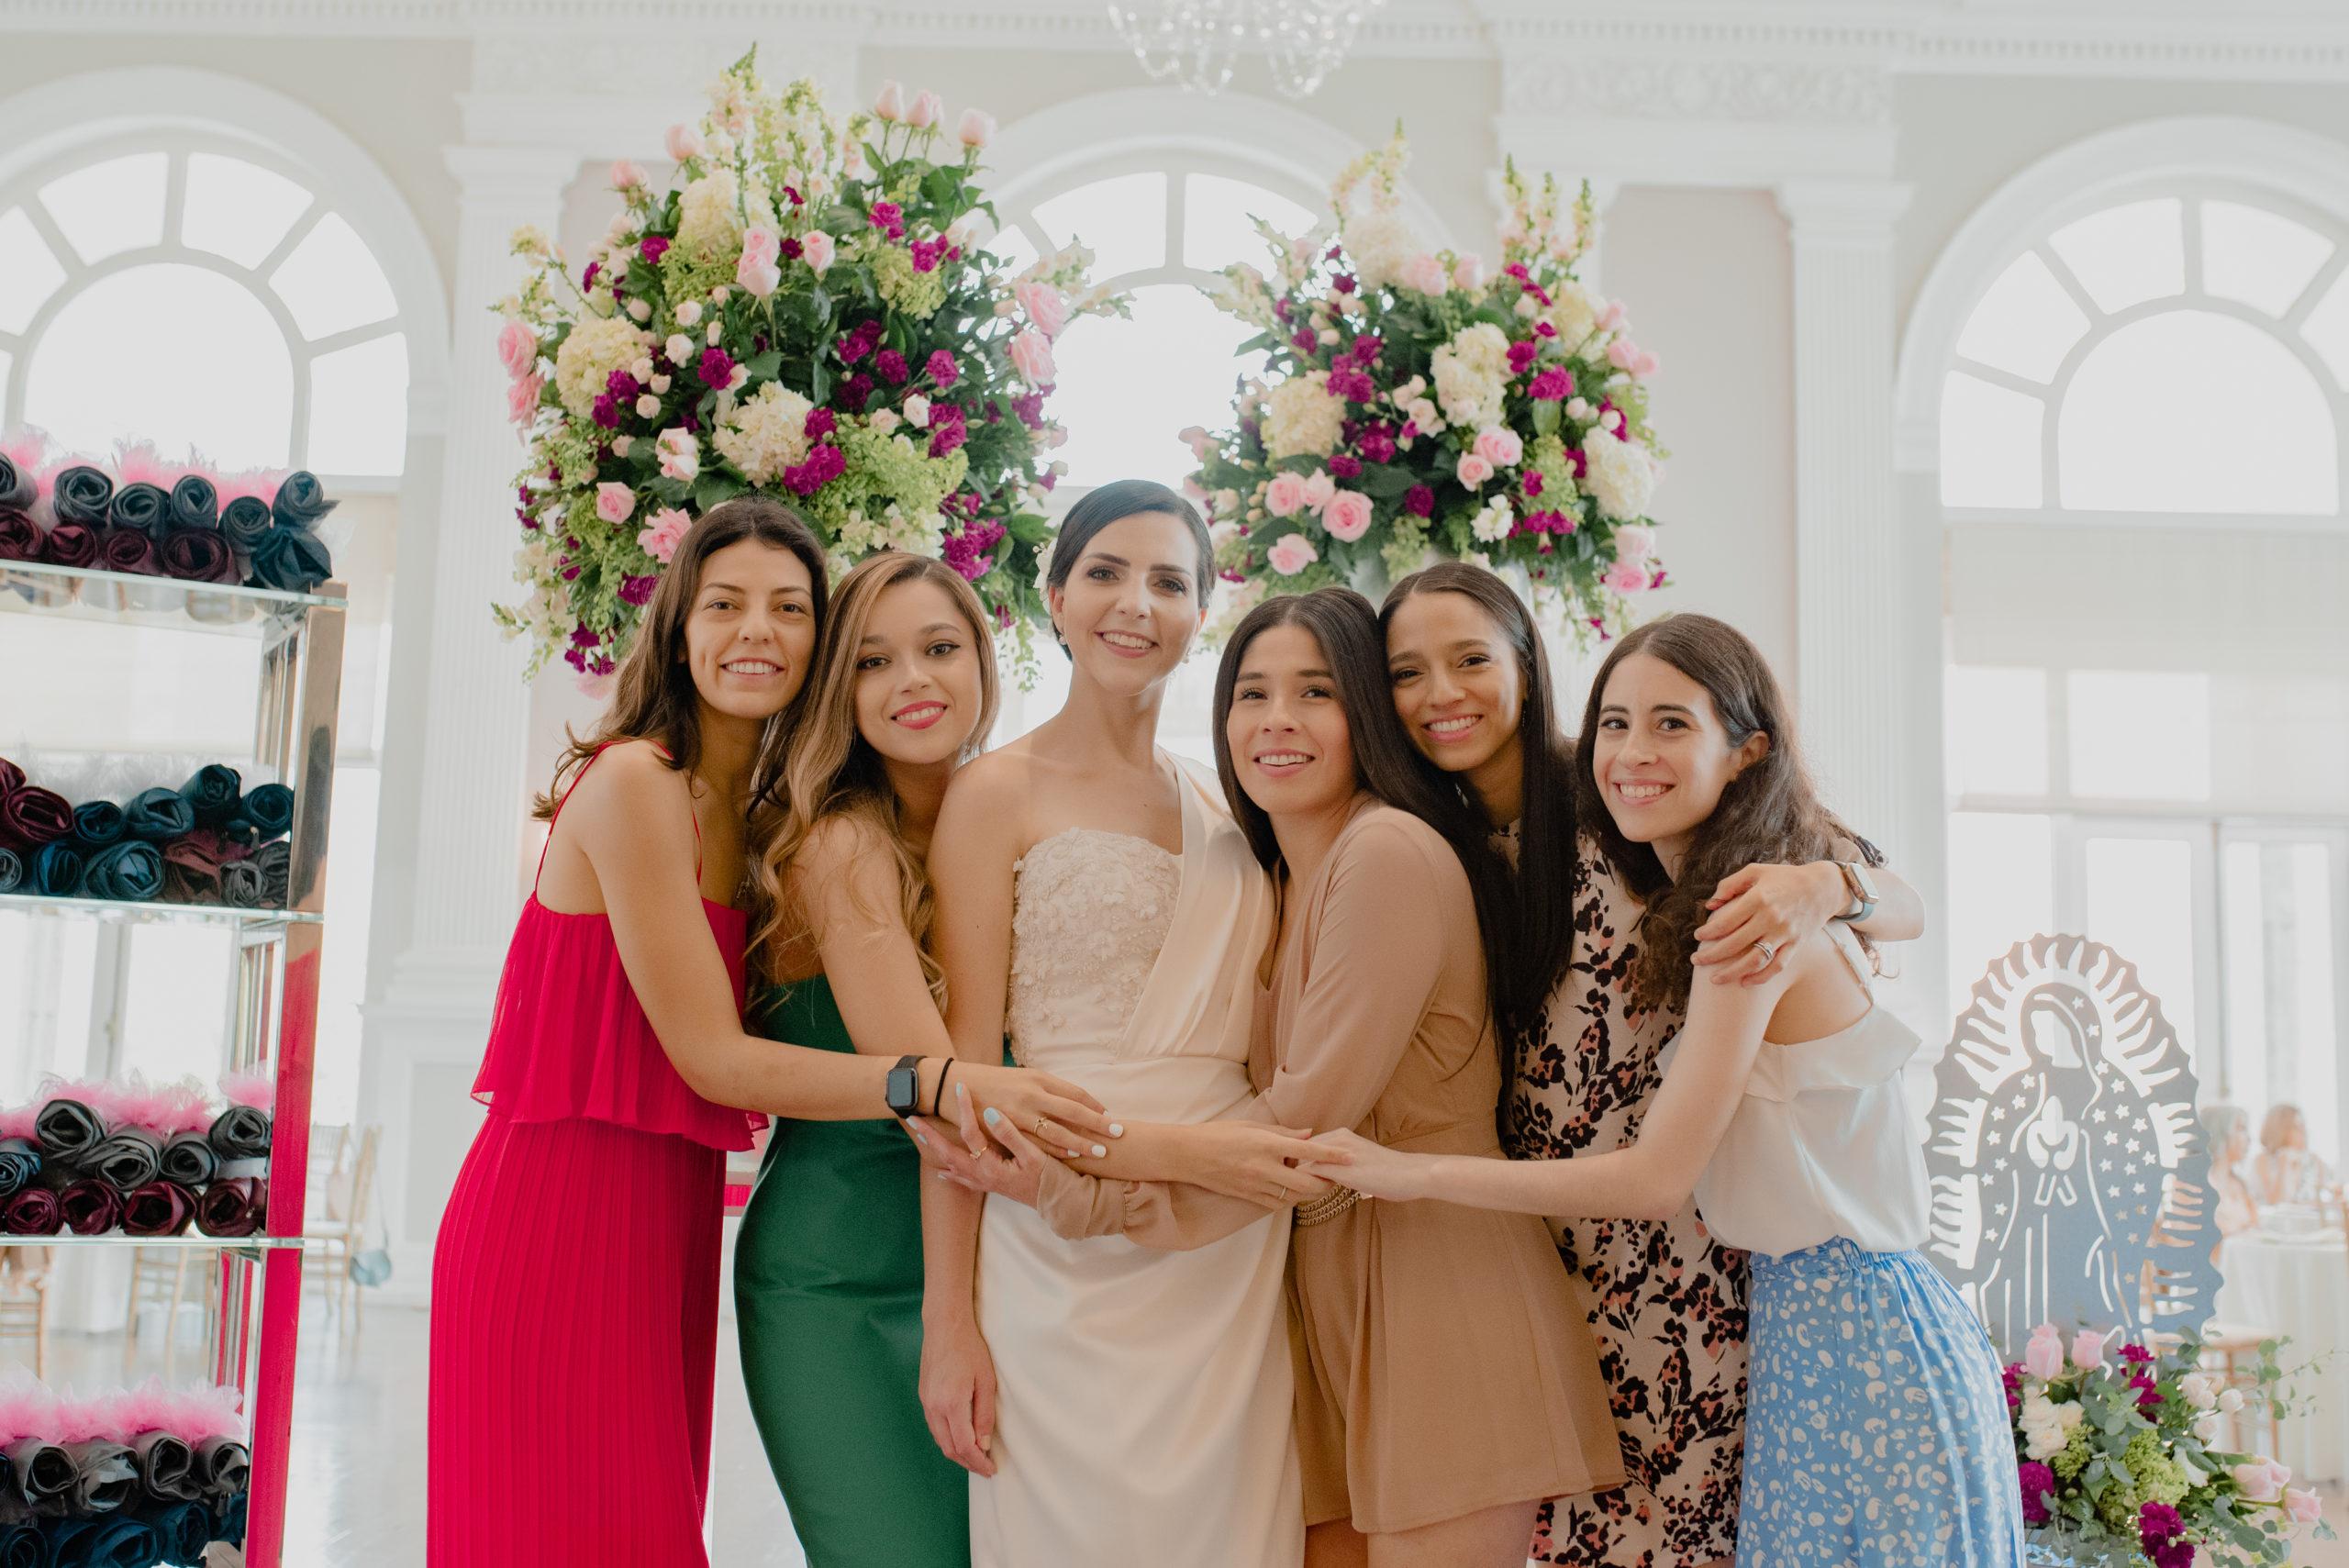 María Fernanda Casas, Gabriela Torres, la festejada, Andrea Aguilar, Sandra Avilés y Mónica Rivera.